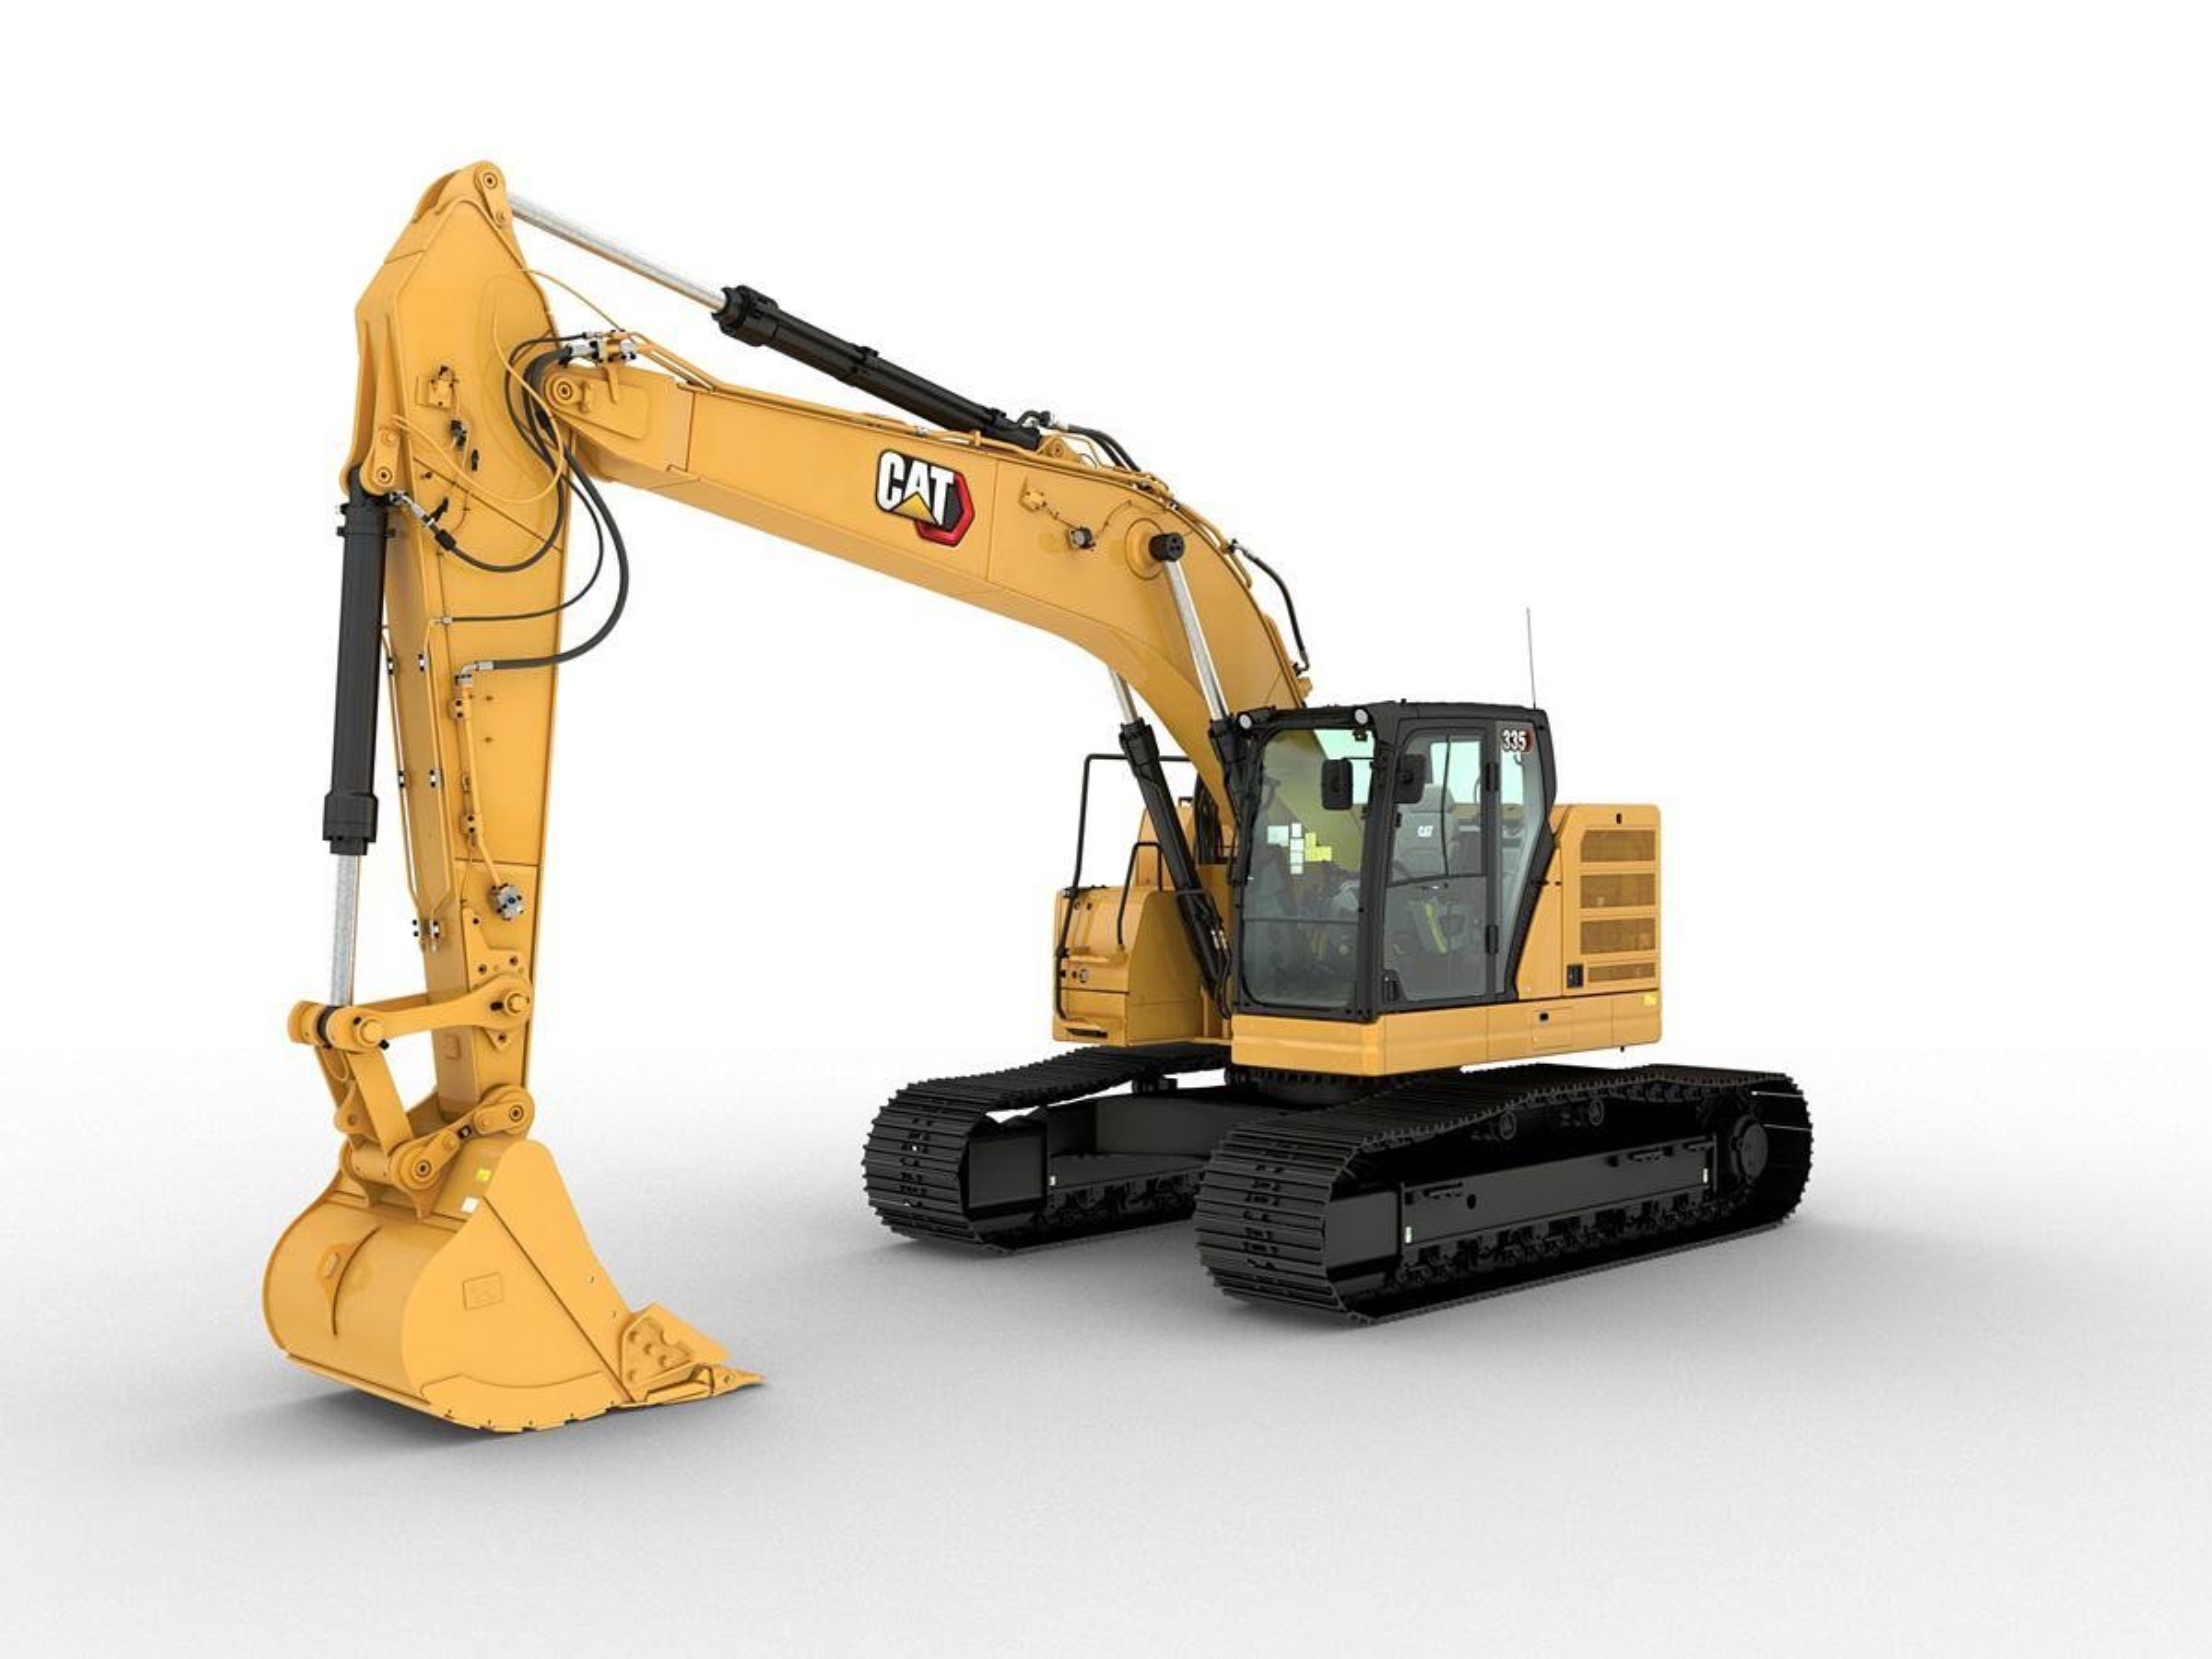 335 Hydraulic Excavator